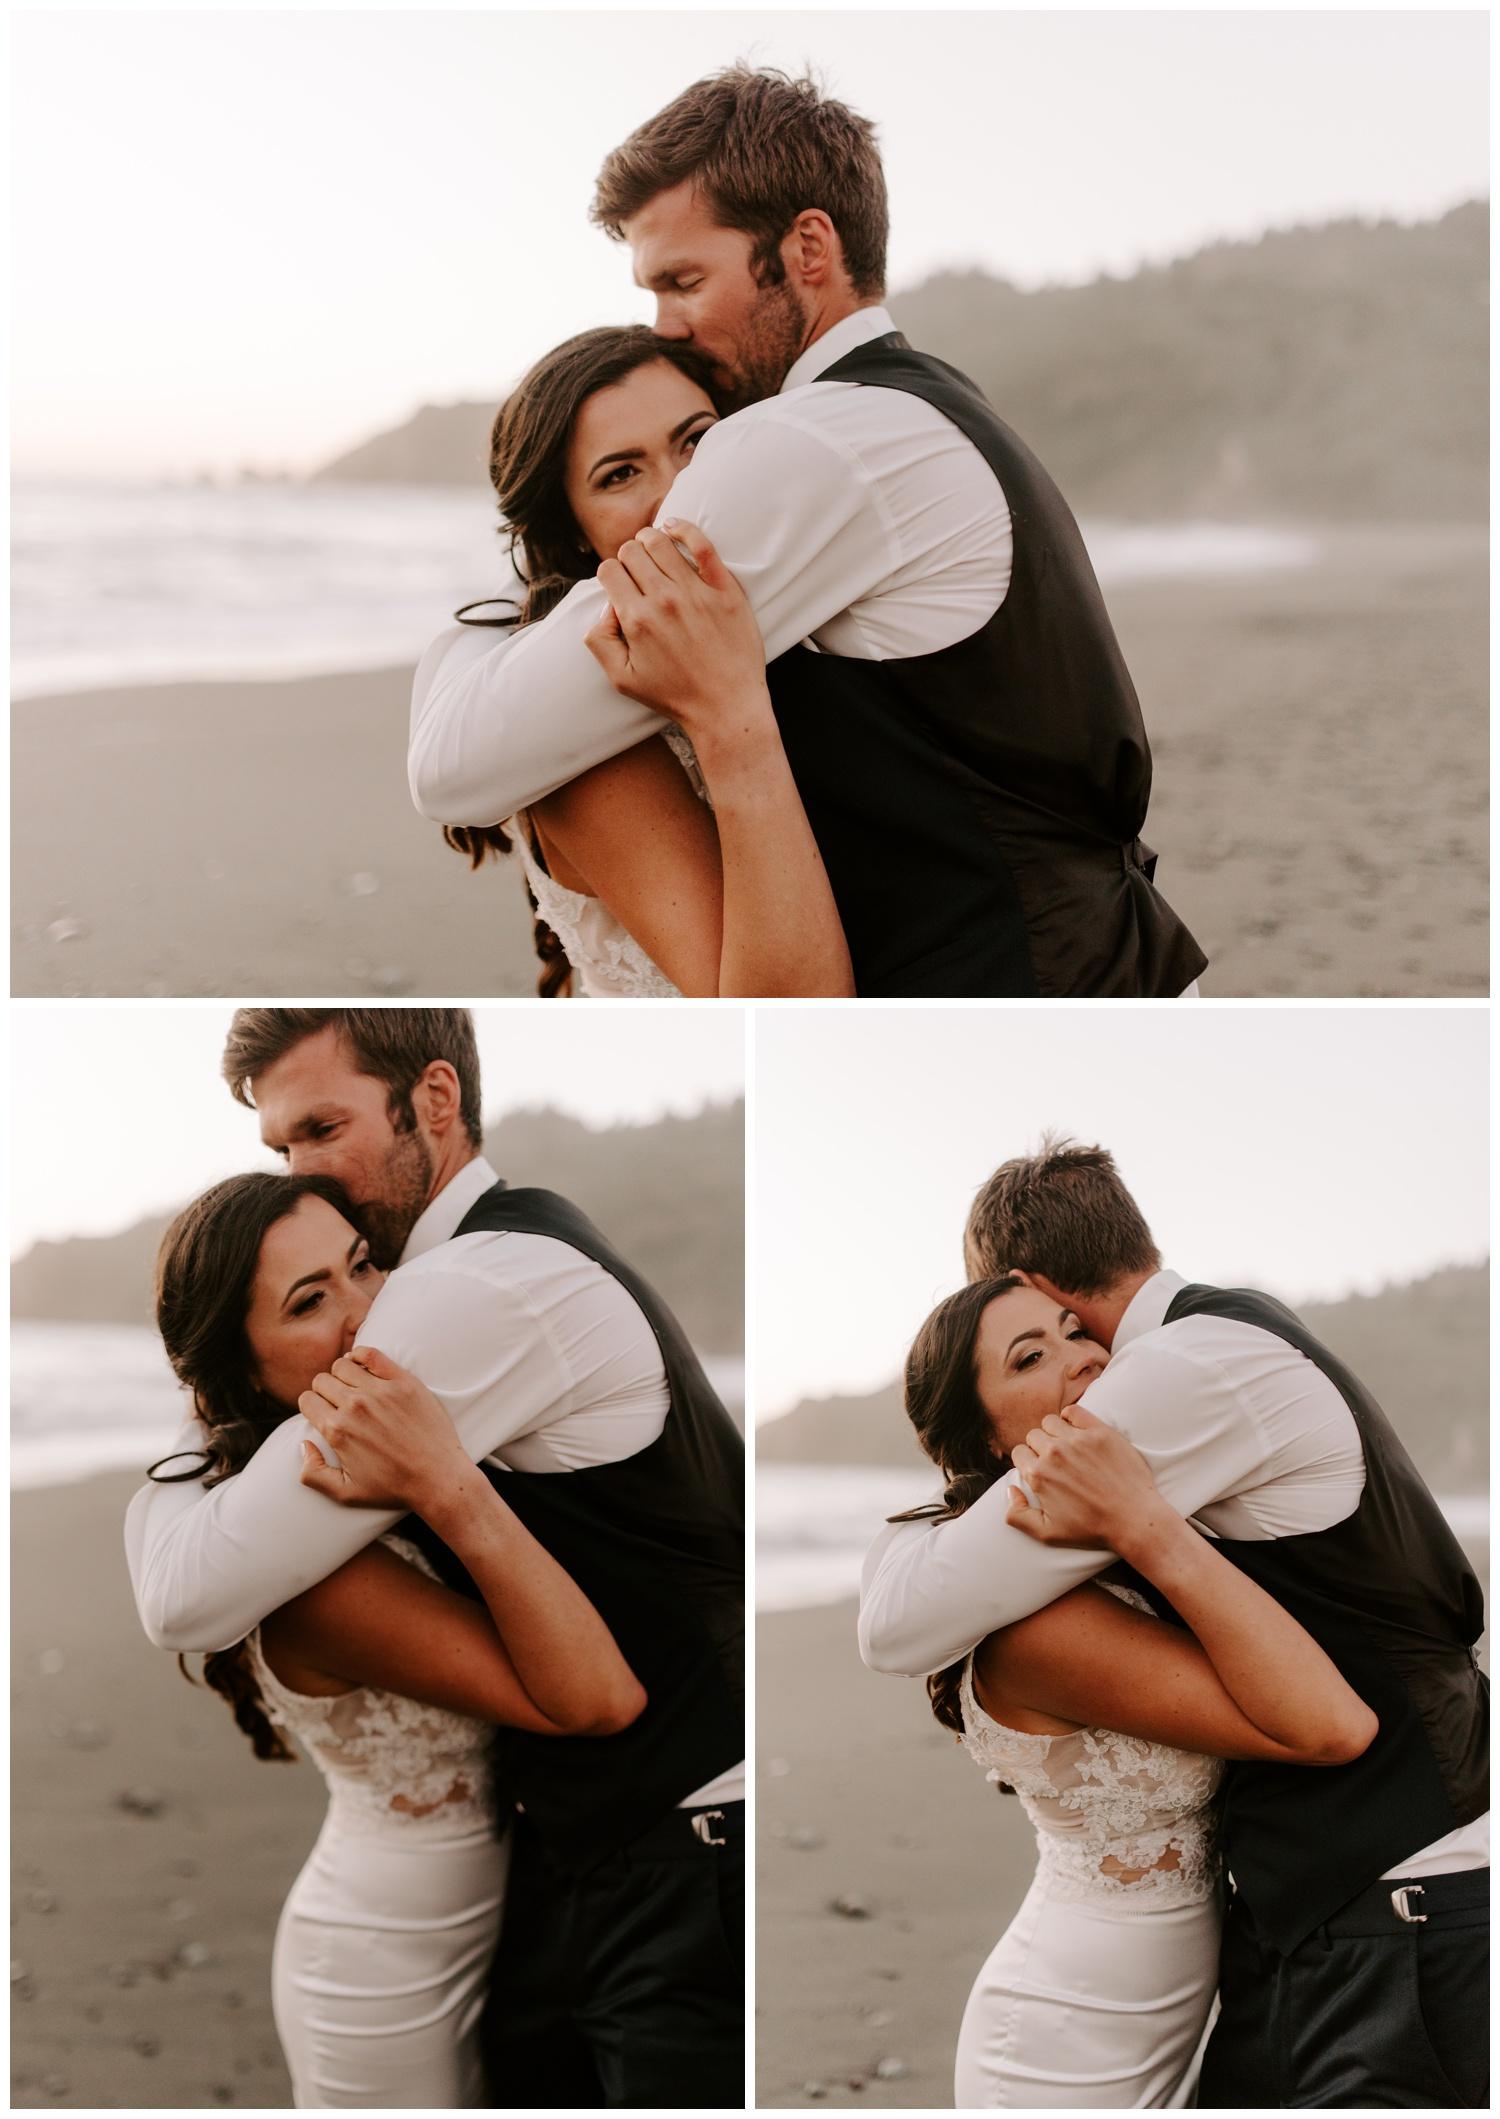 Klamath River Northern California Wedding - Oceana and Kenton - Jessica Heron Images 103.jpg